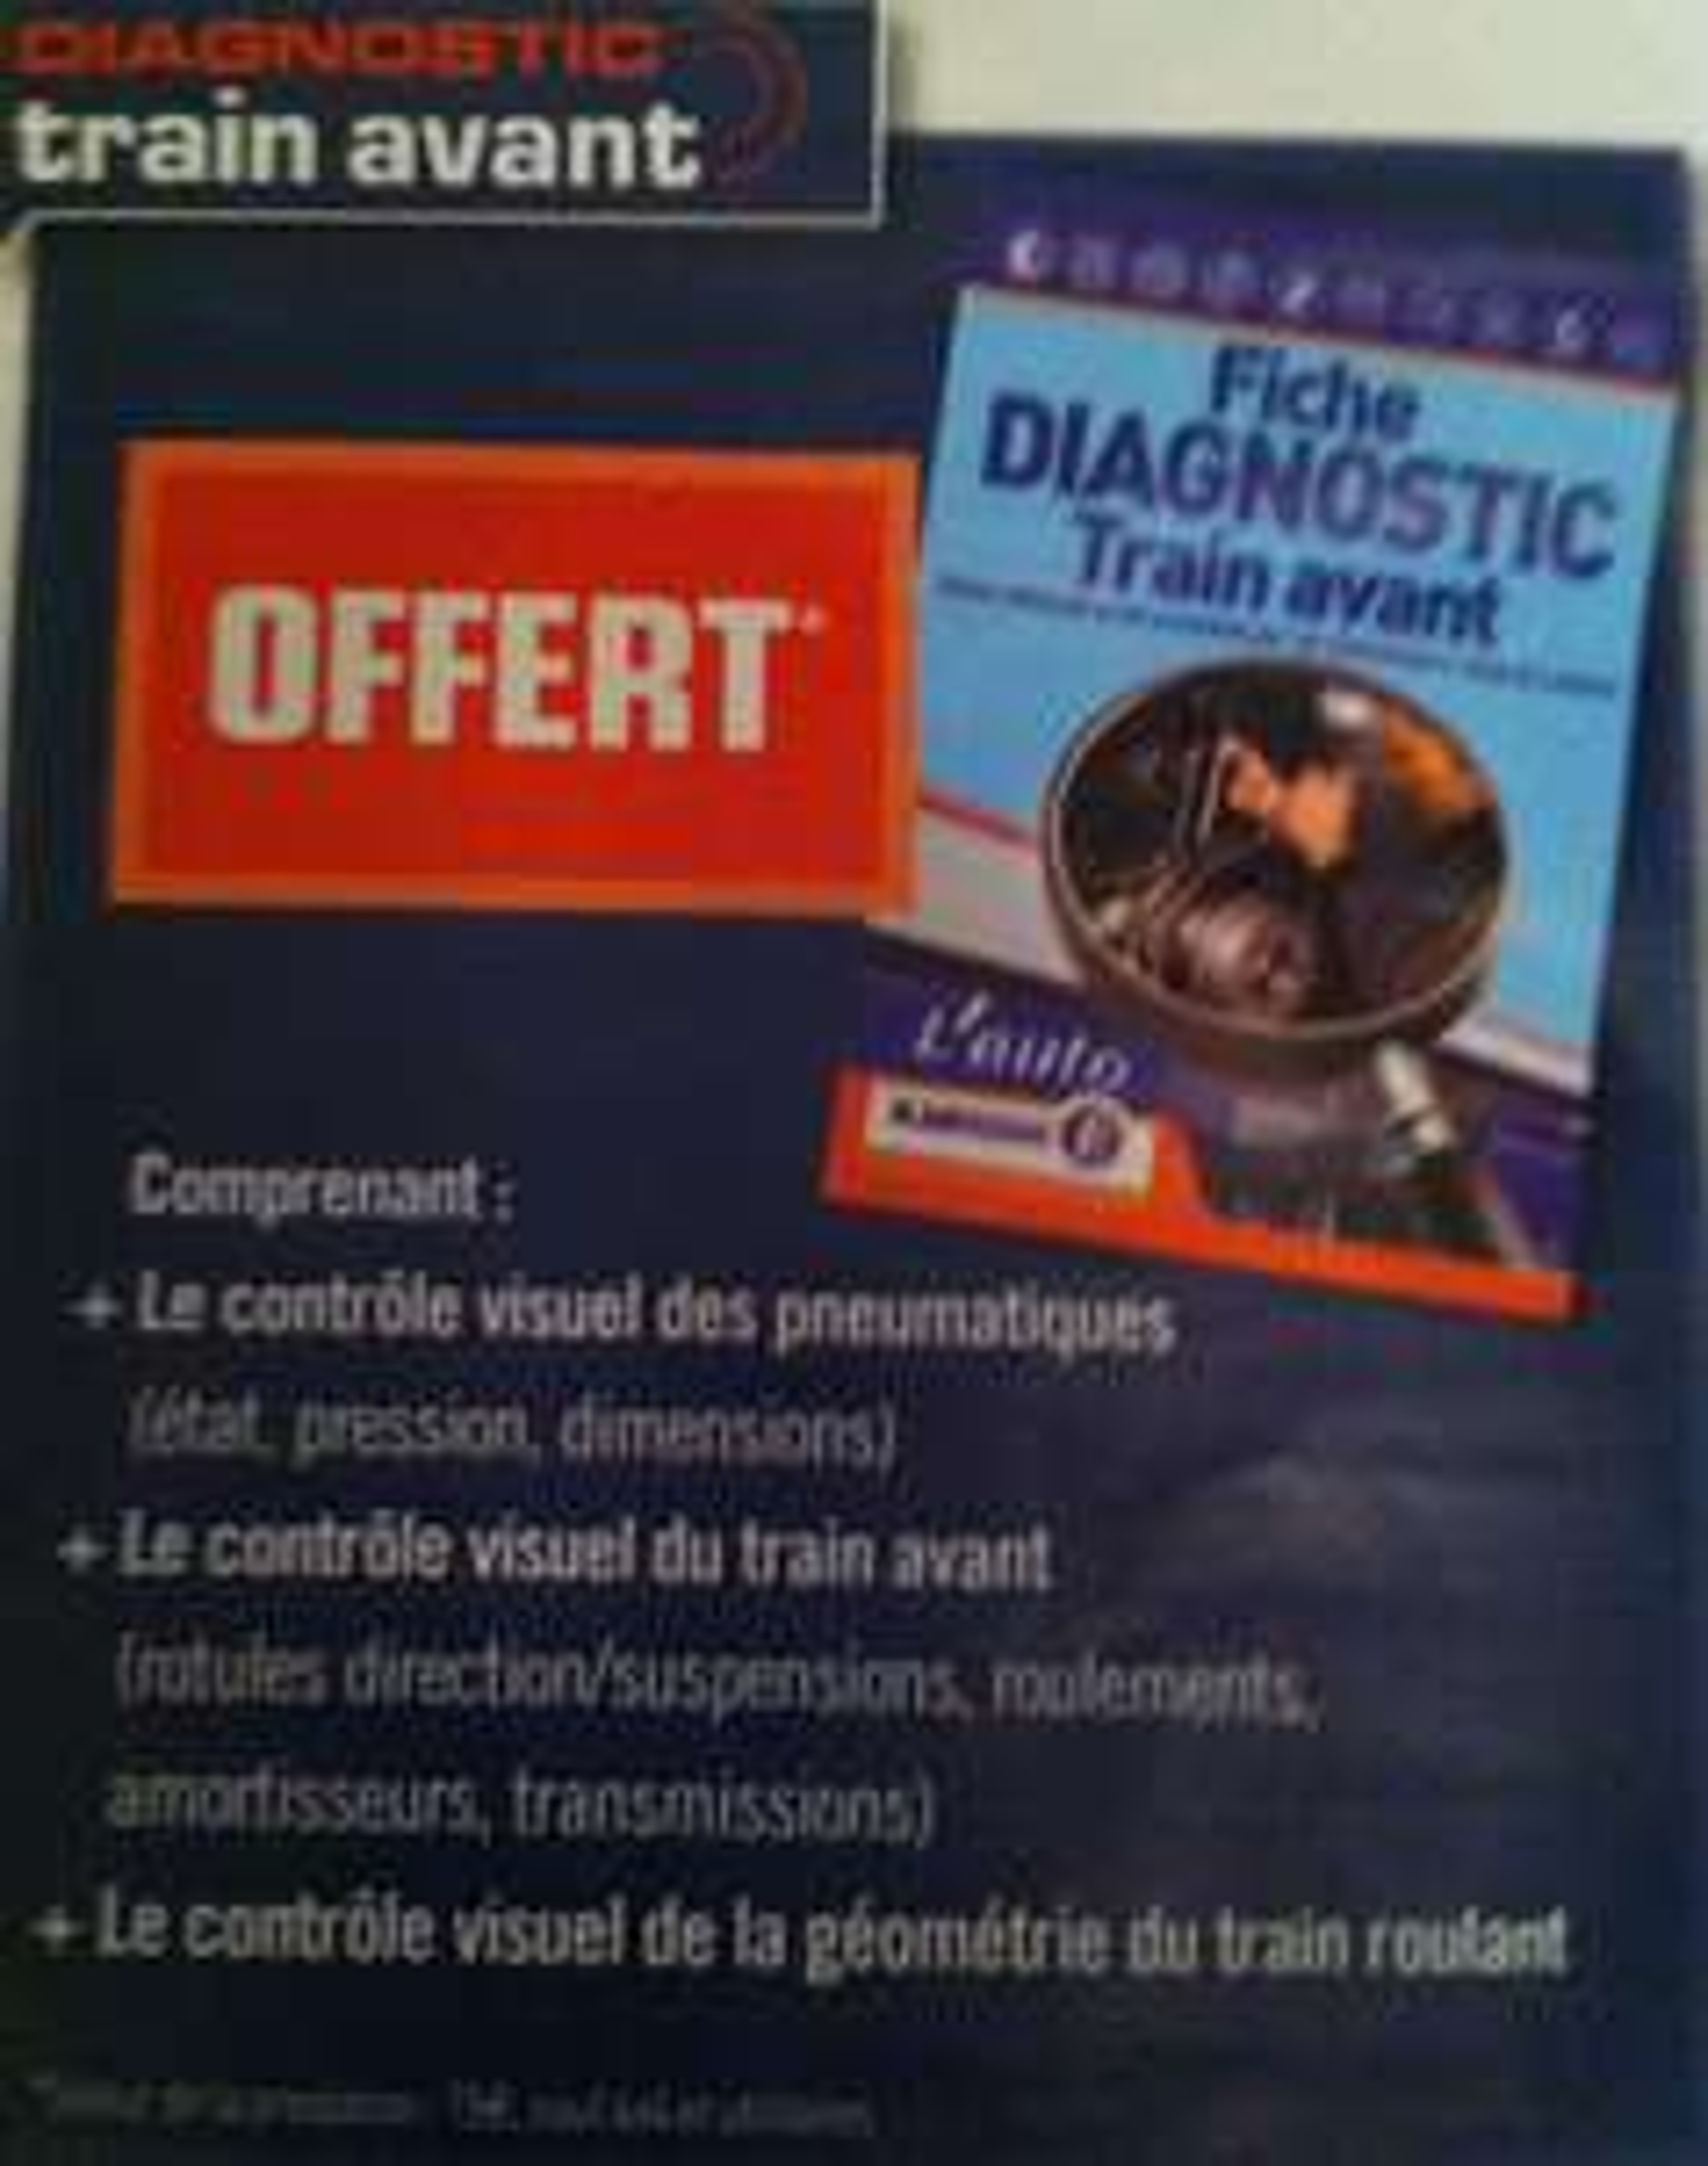 Fiche diagnostic train avant offert